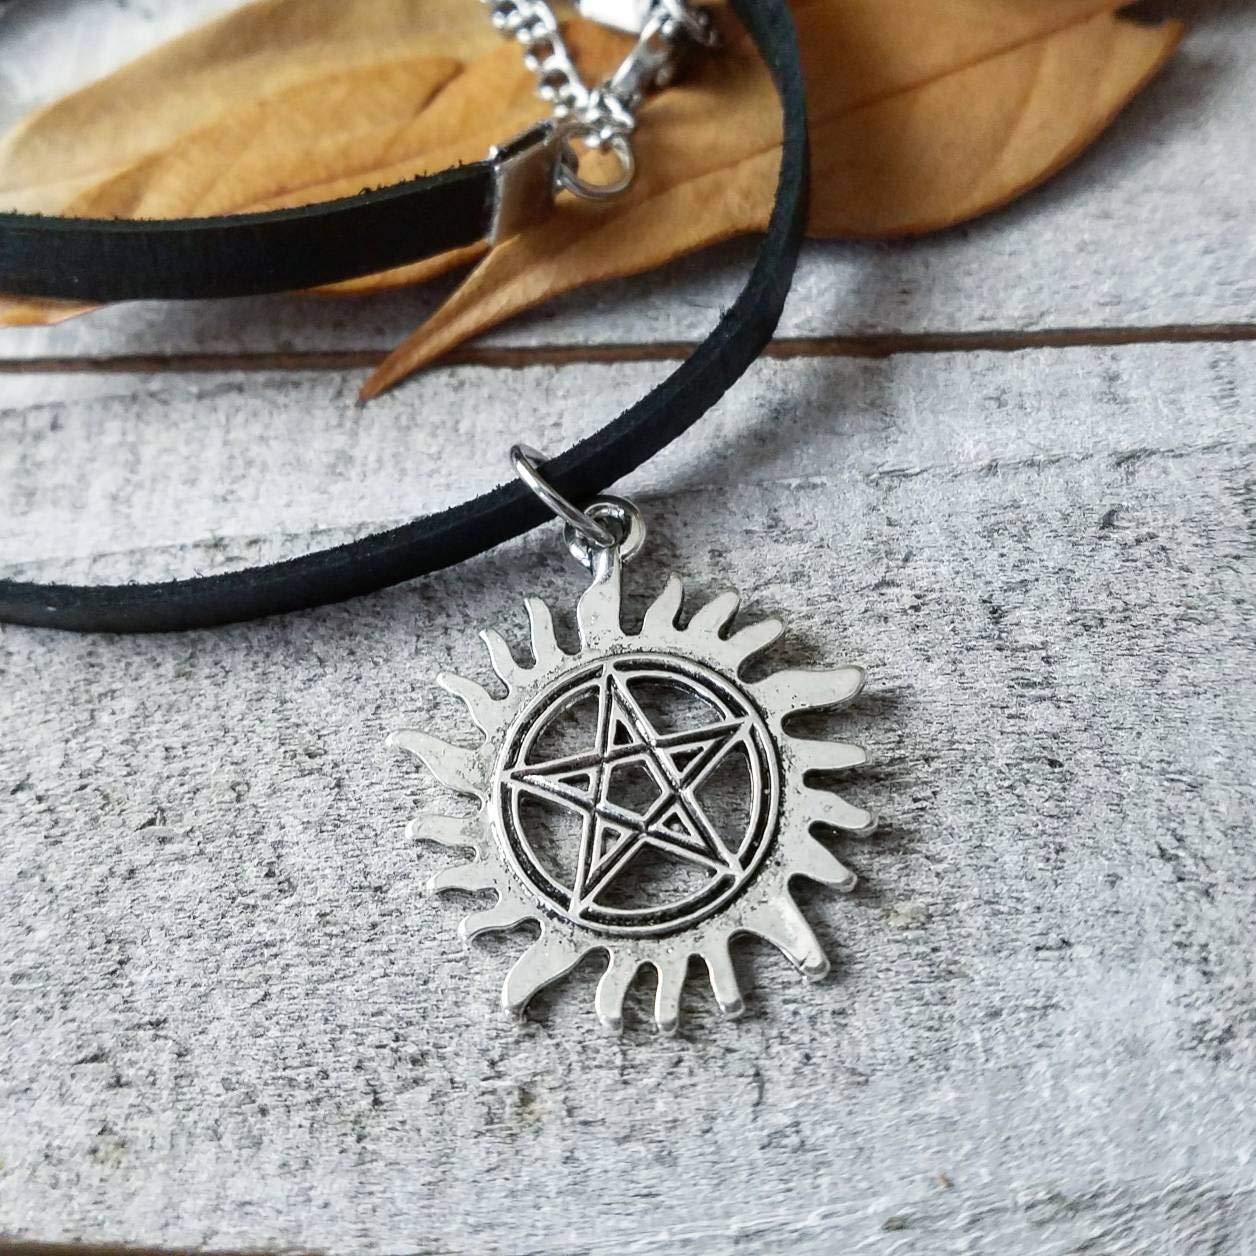 Anti possession sigil Supernatural choker necklace thin black